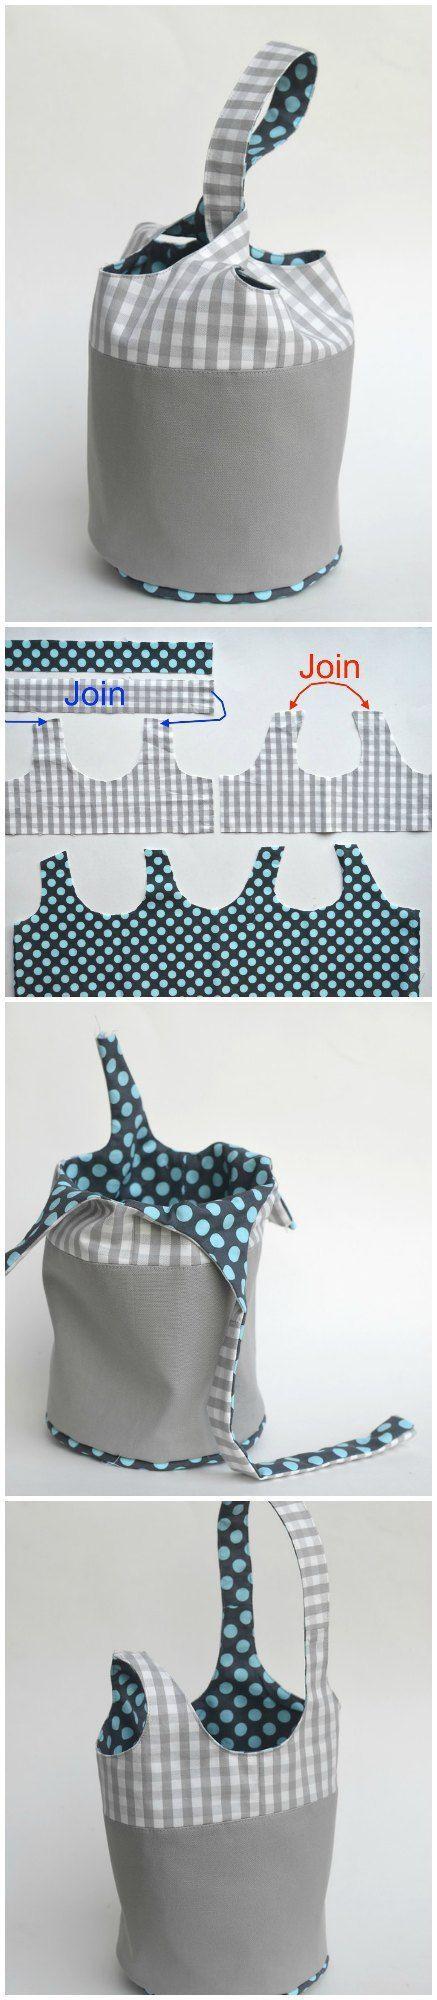 Bucket tote – free pattern